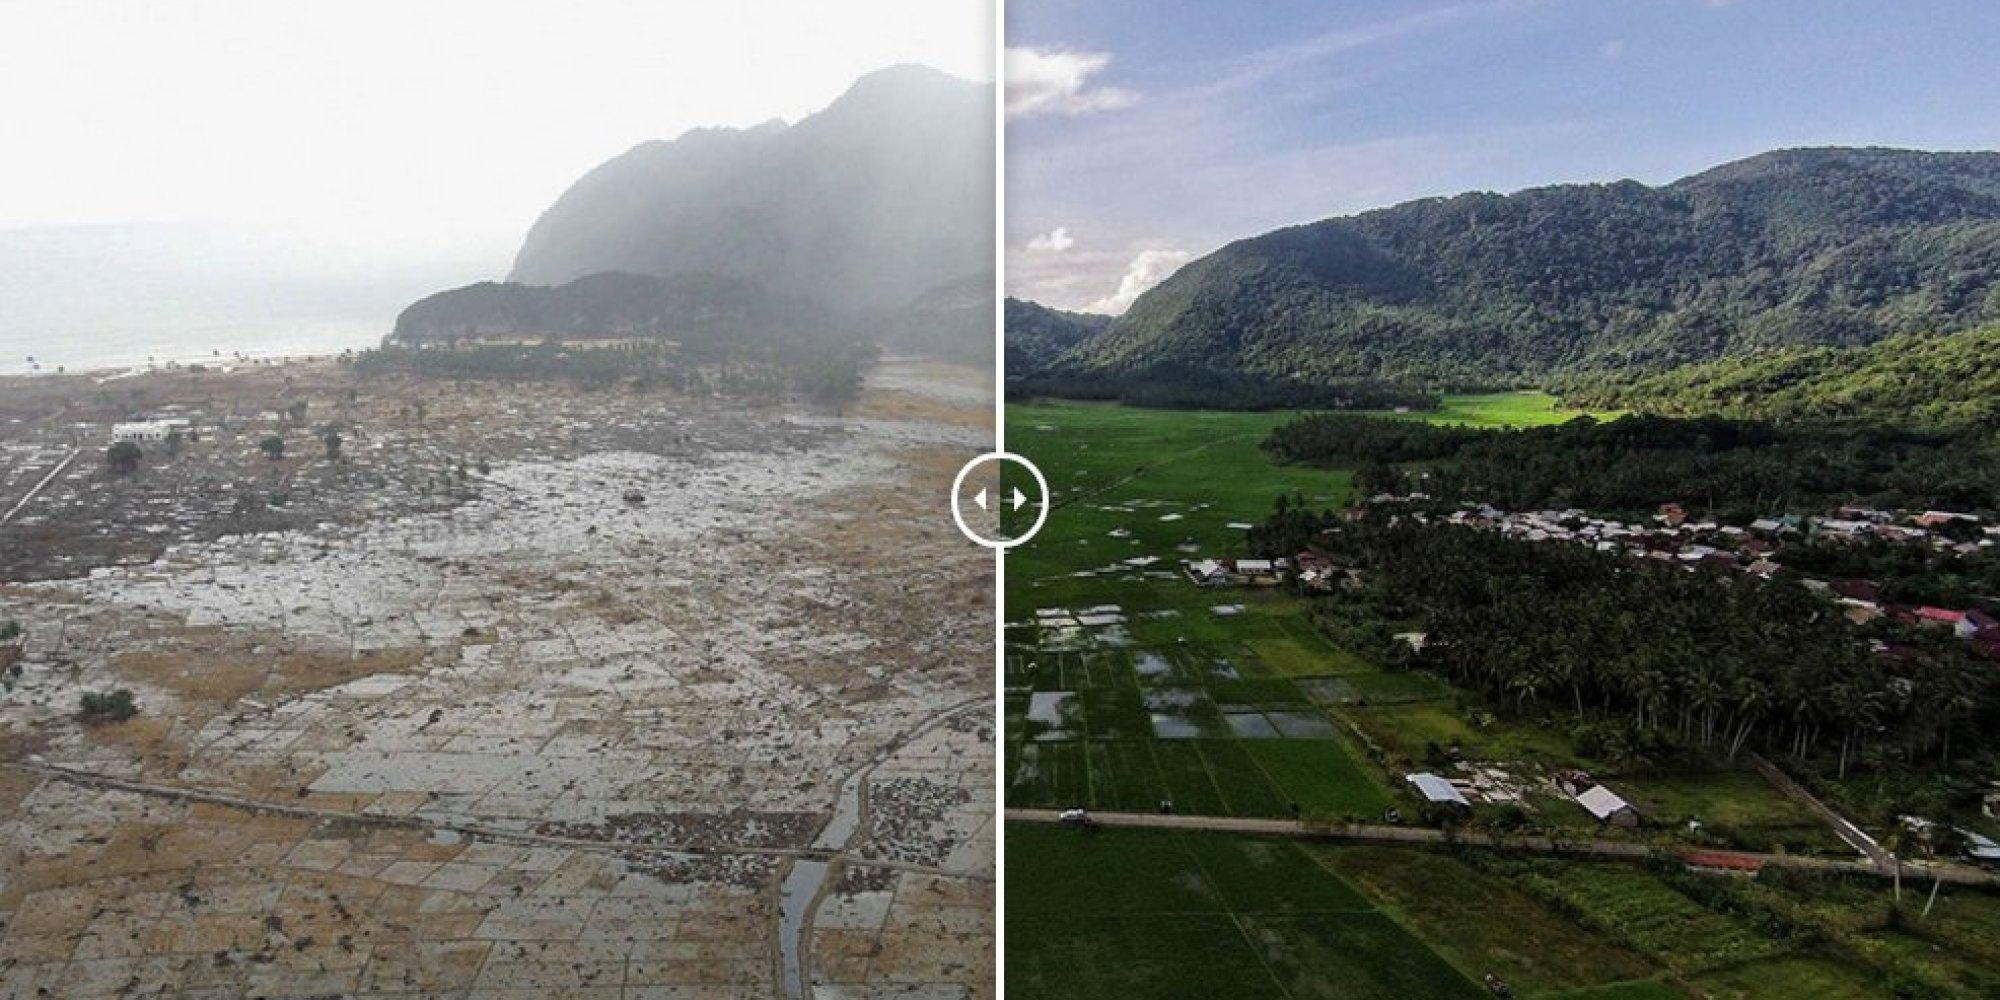 Tsunami de Asia - Maremoto un Desastre Natural en asia